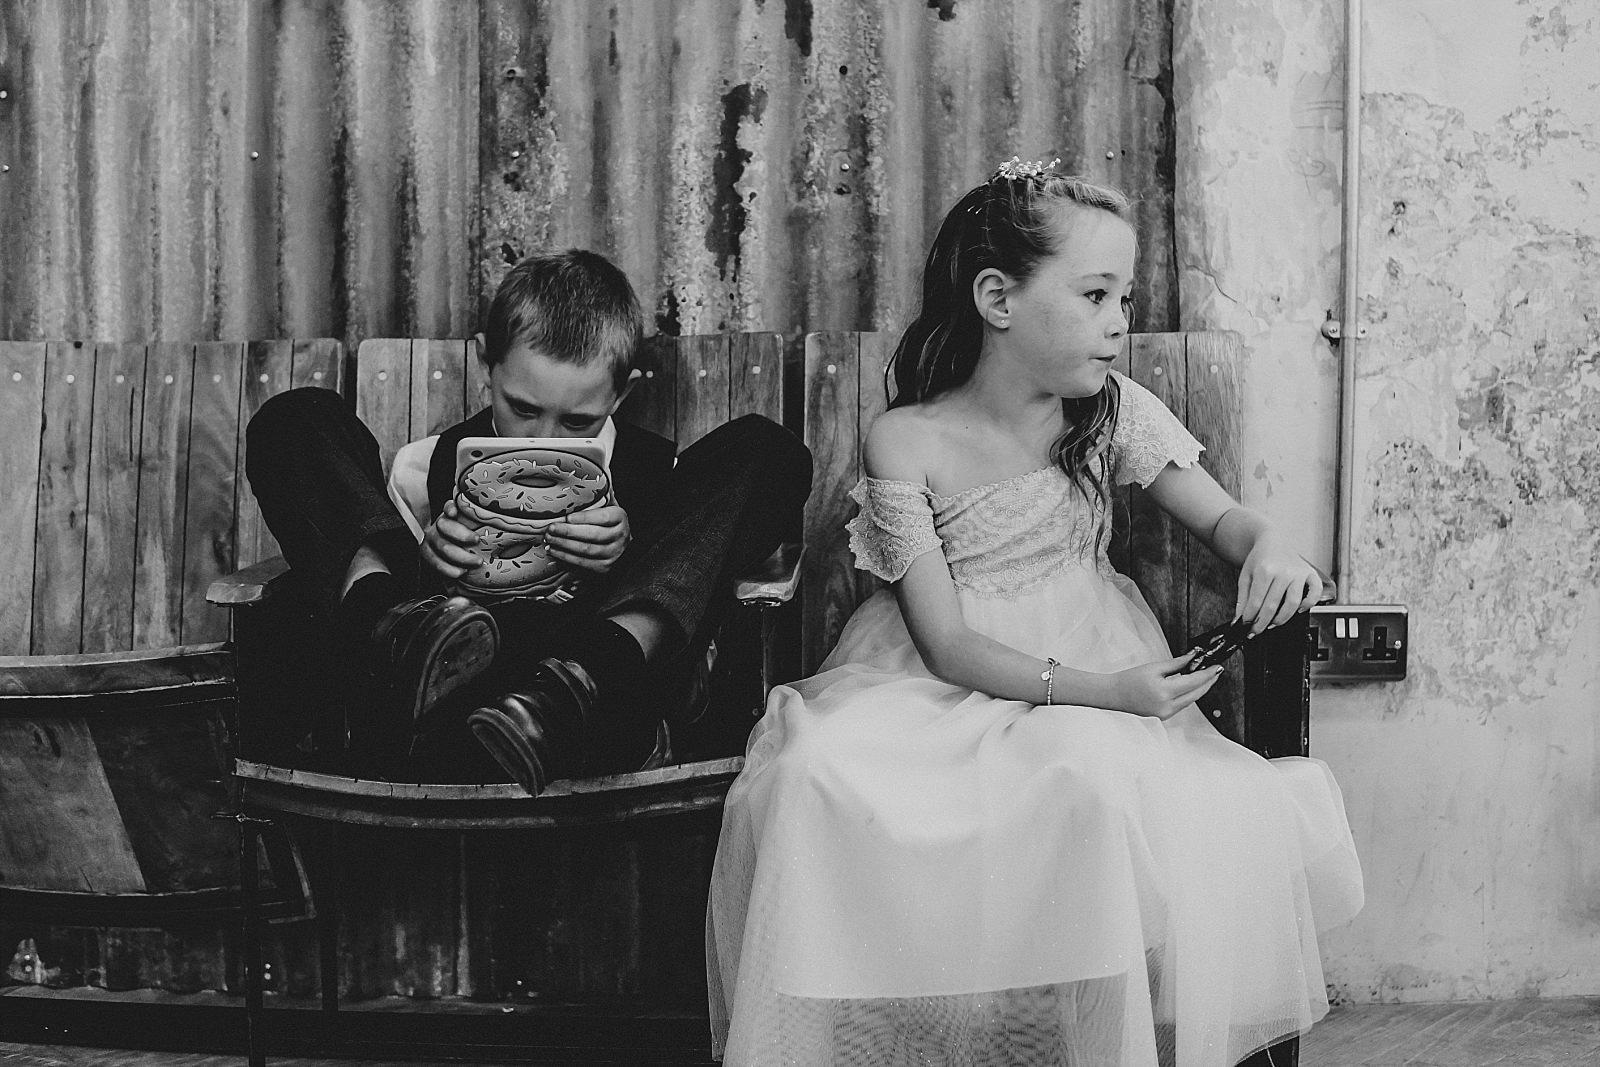 documentary unposed photo of children unaware